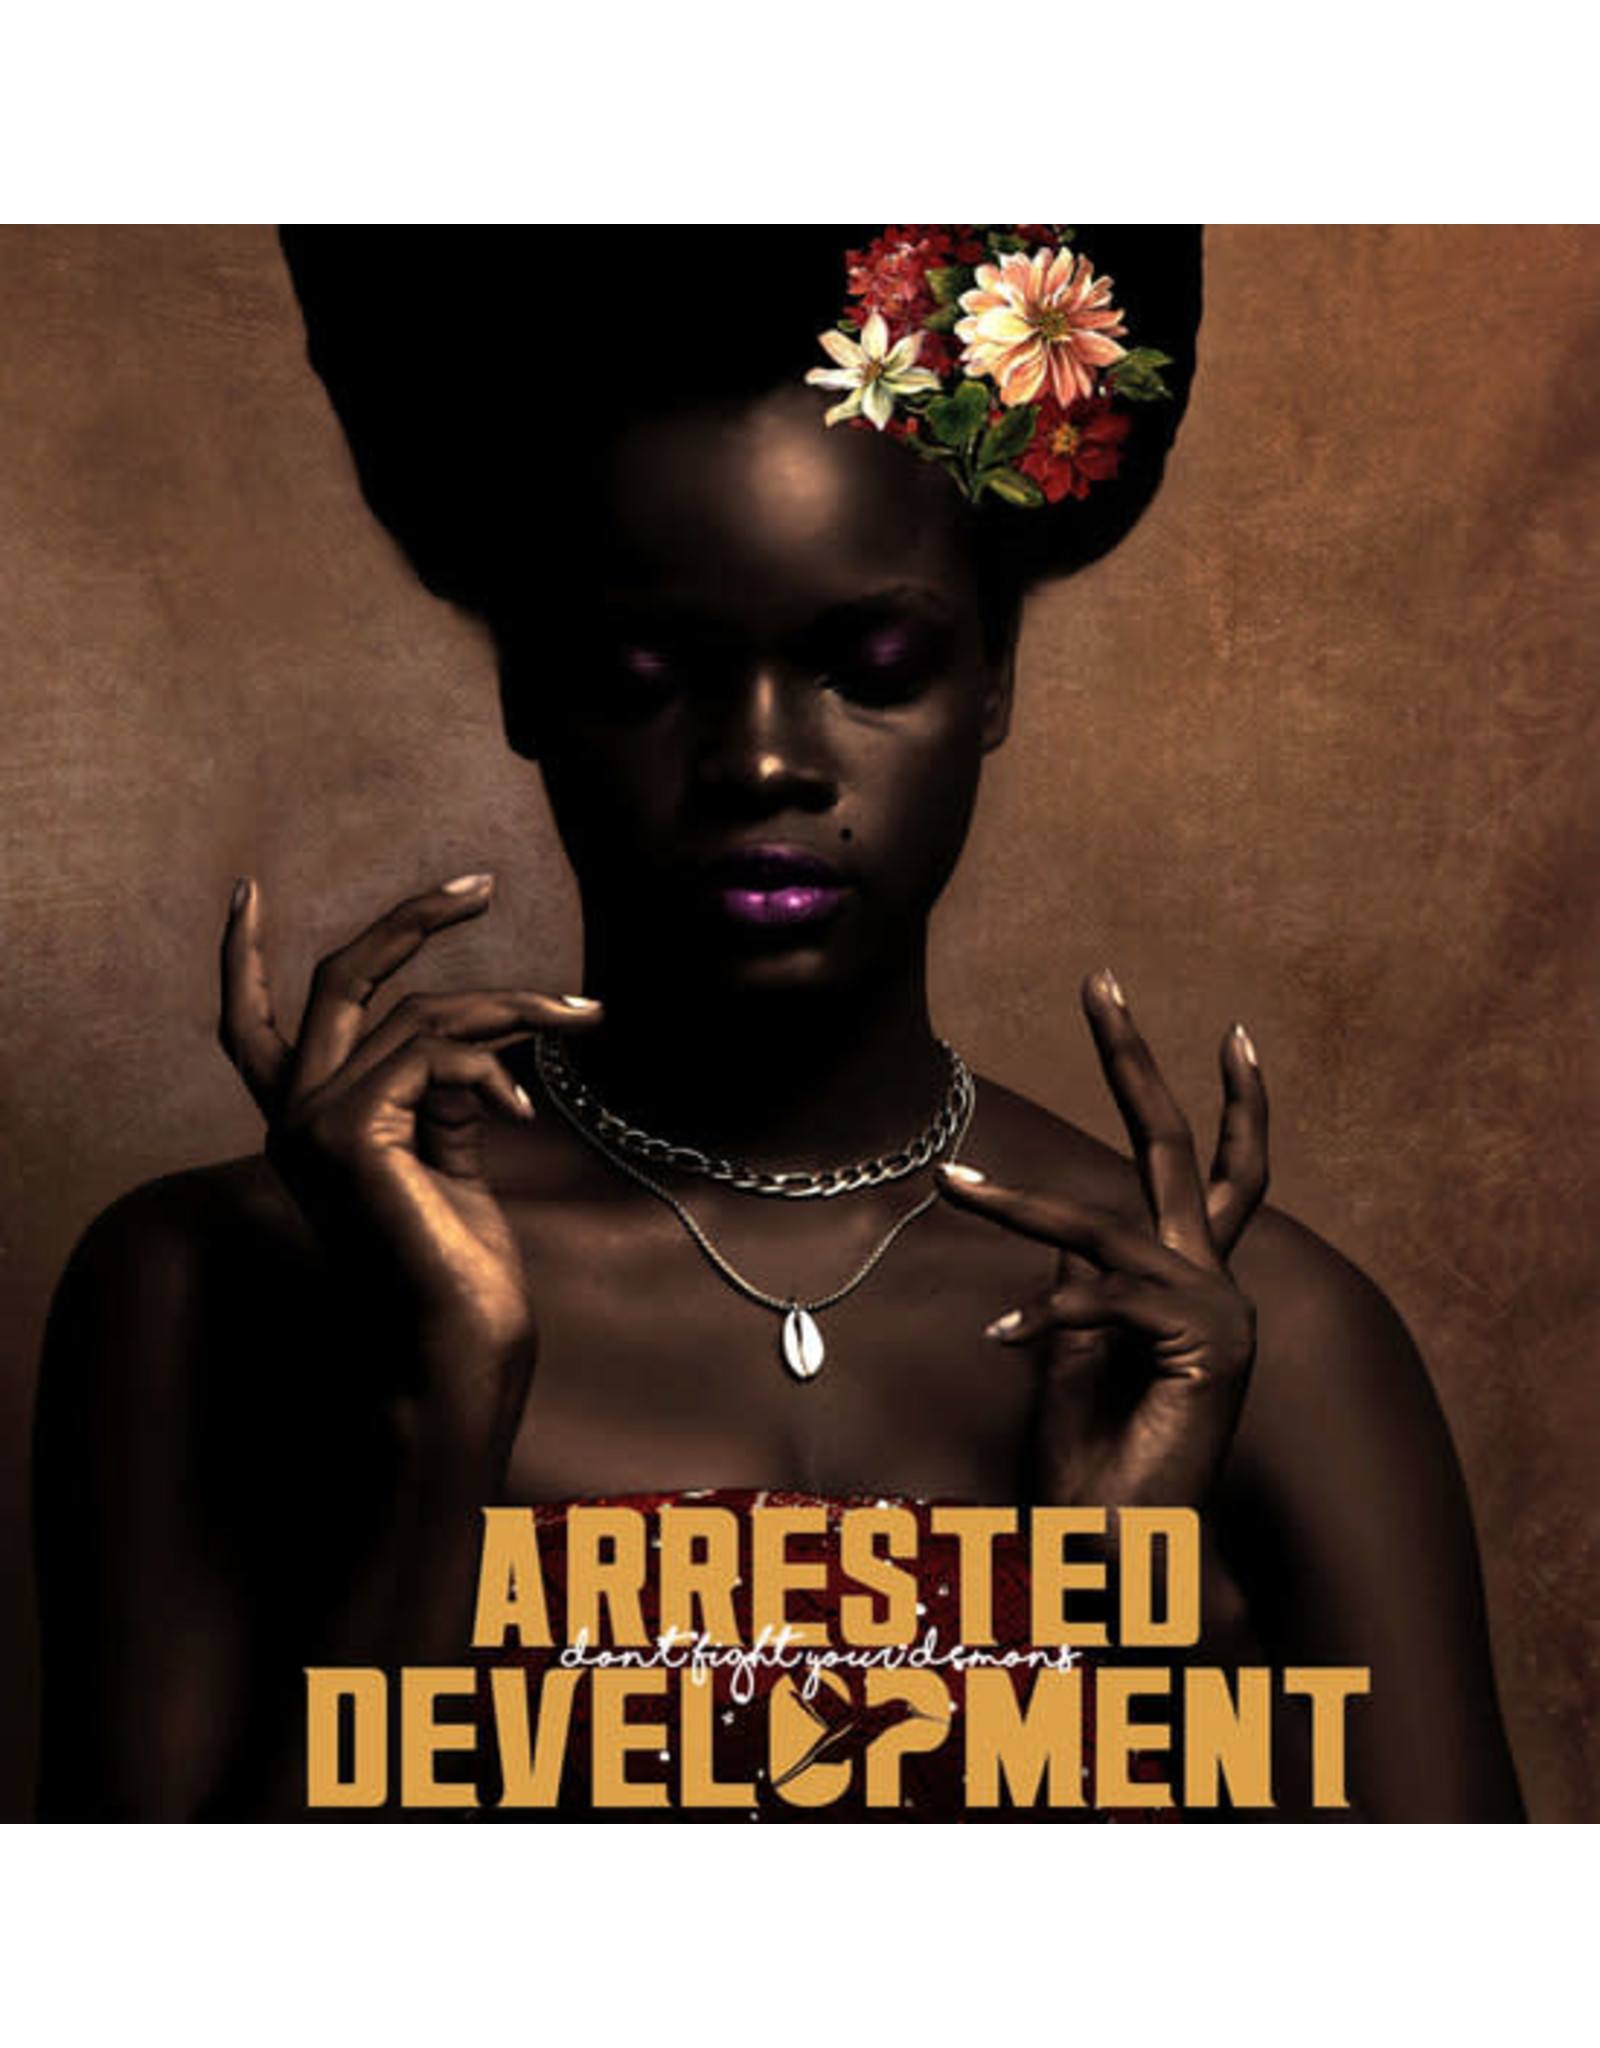 Mosta Arrested Development: Don't Fight Your Demons LP